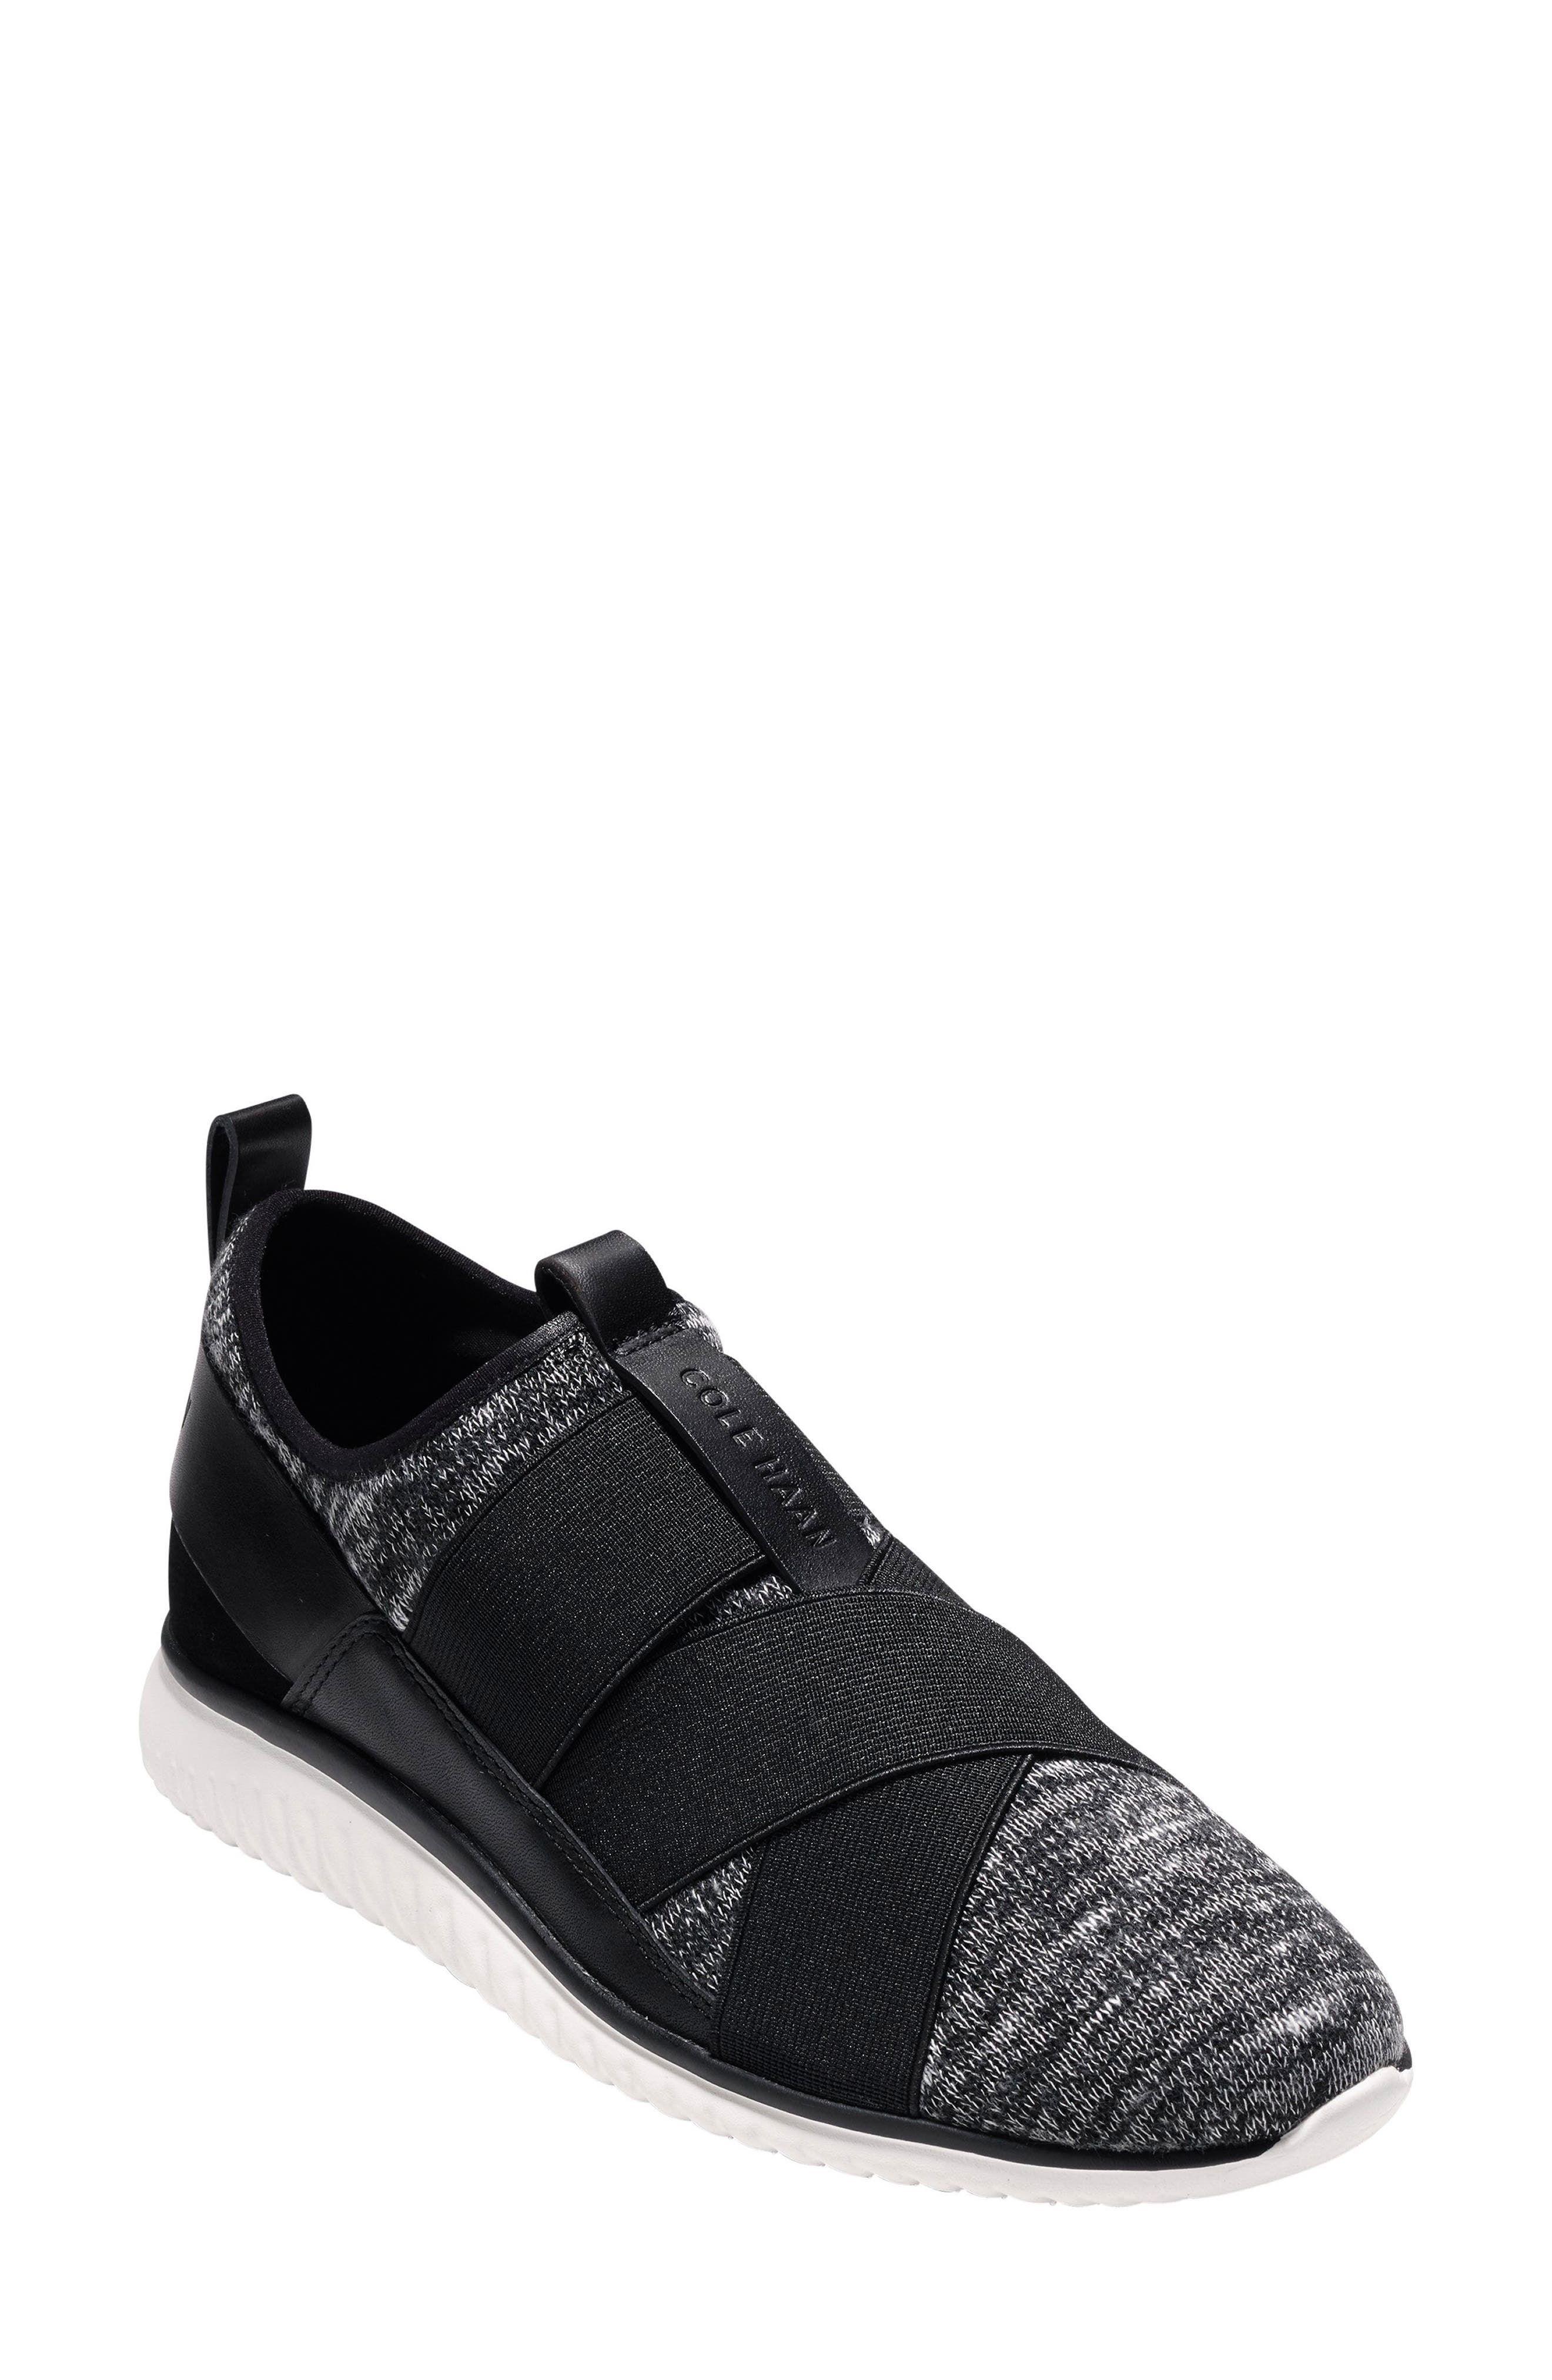 'StudioGrand' Sneaker,                             Main thumbnail 1, color,                             002